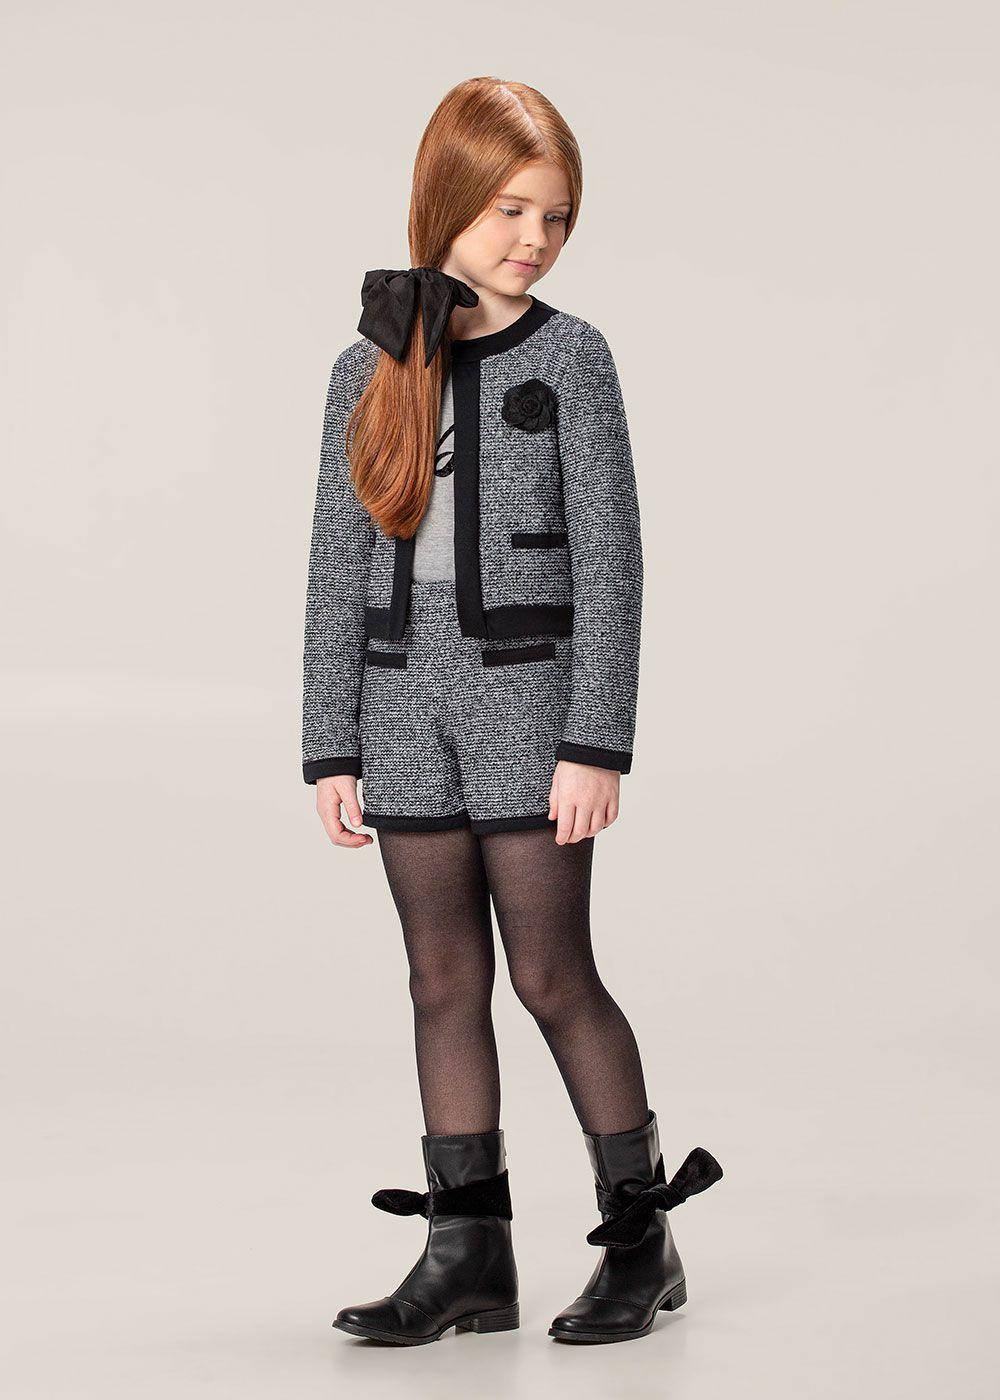 Conjunto Infantil Feminino Inverno Cinza Tweed Carinhoso